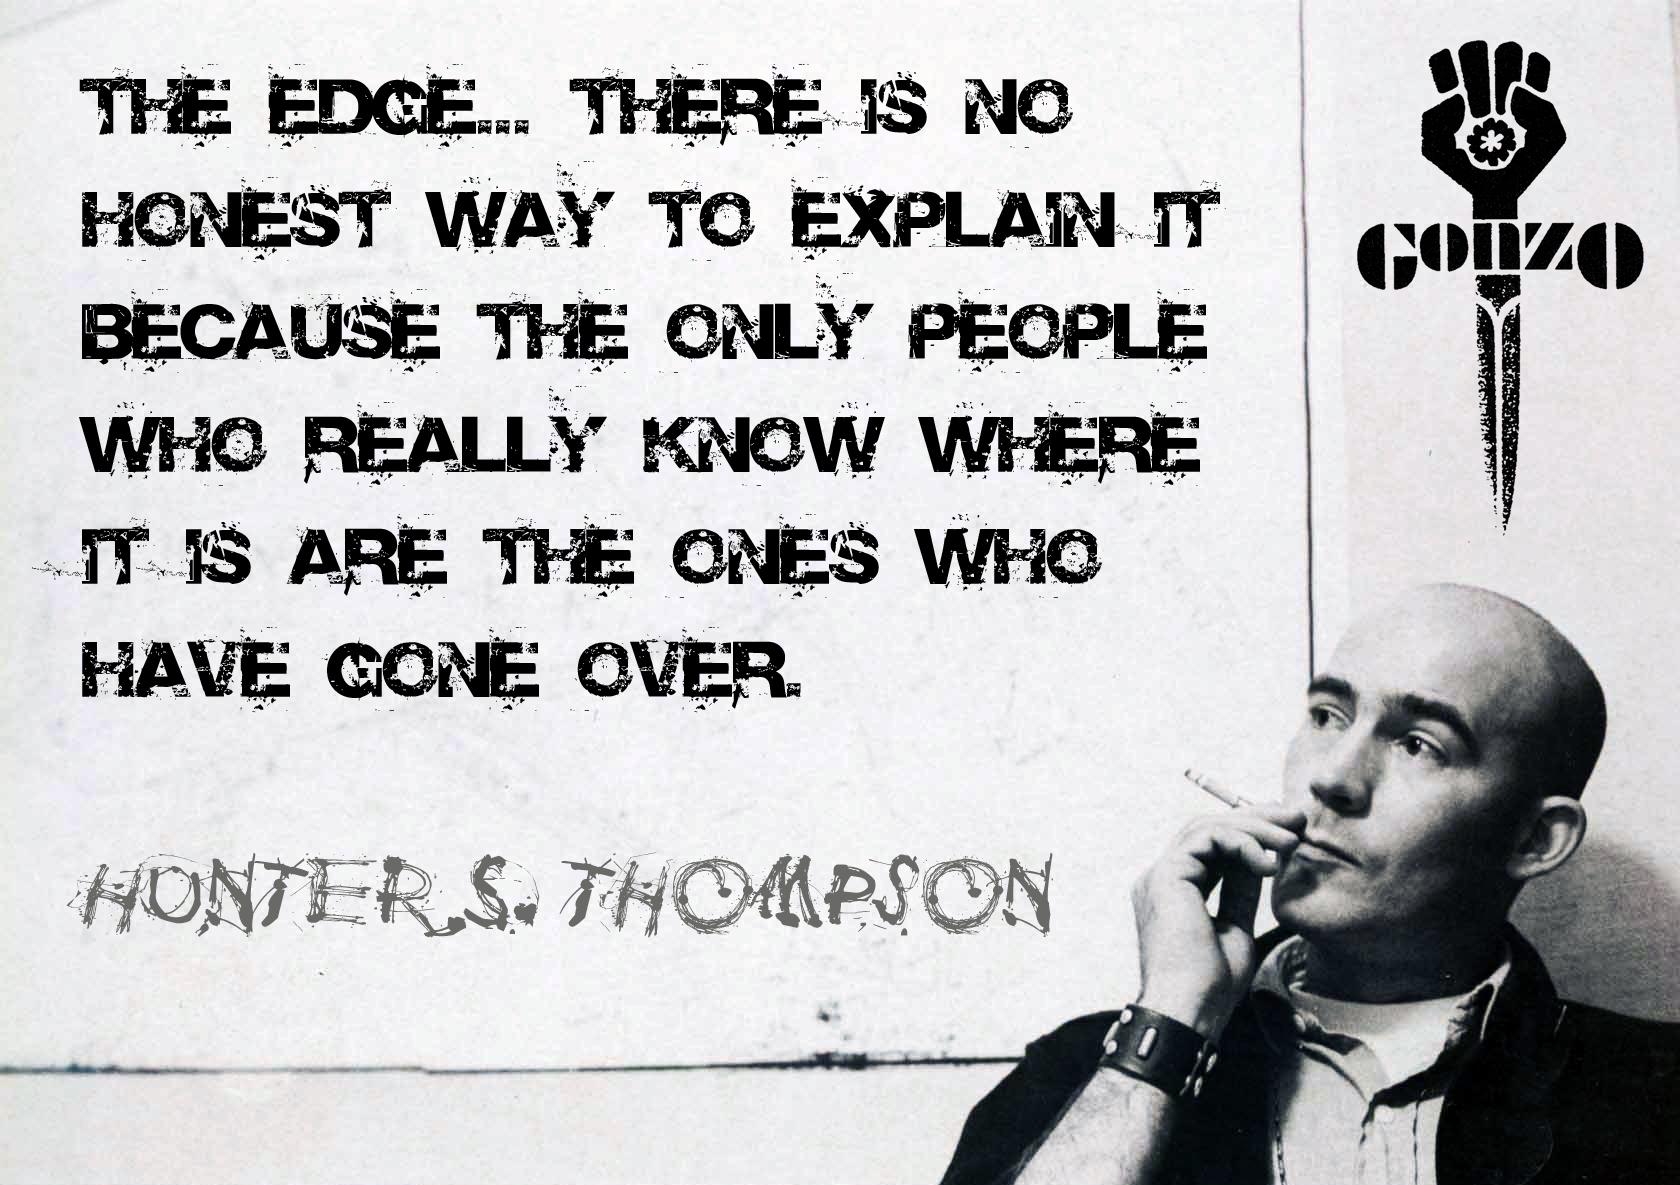 Hunter S. Thompson's quote #1